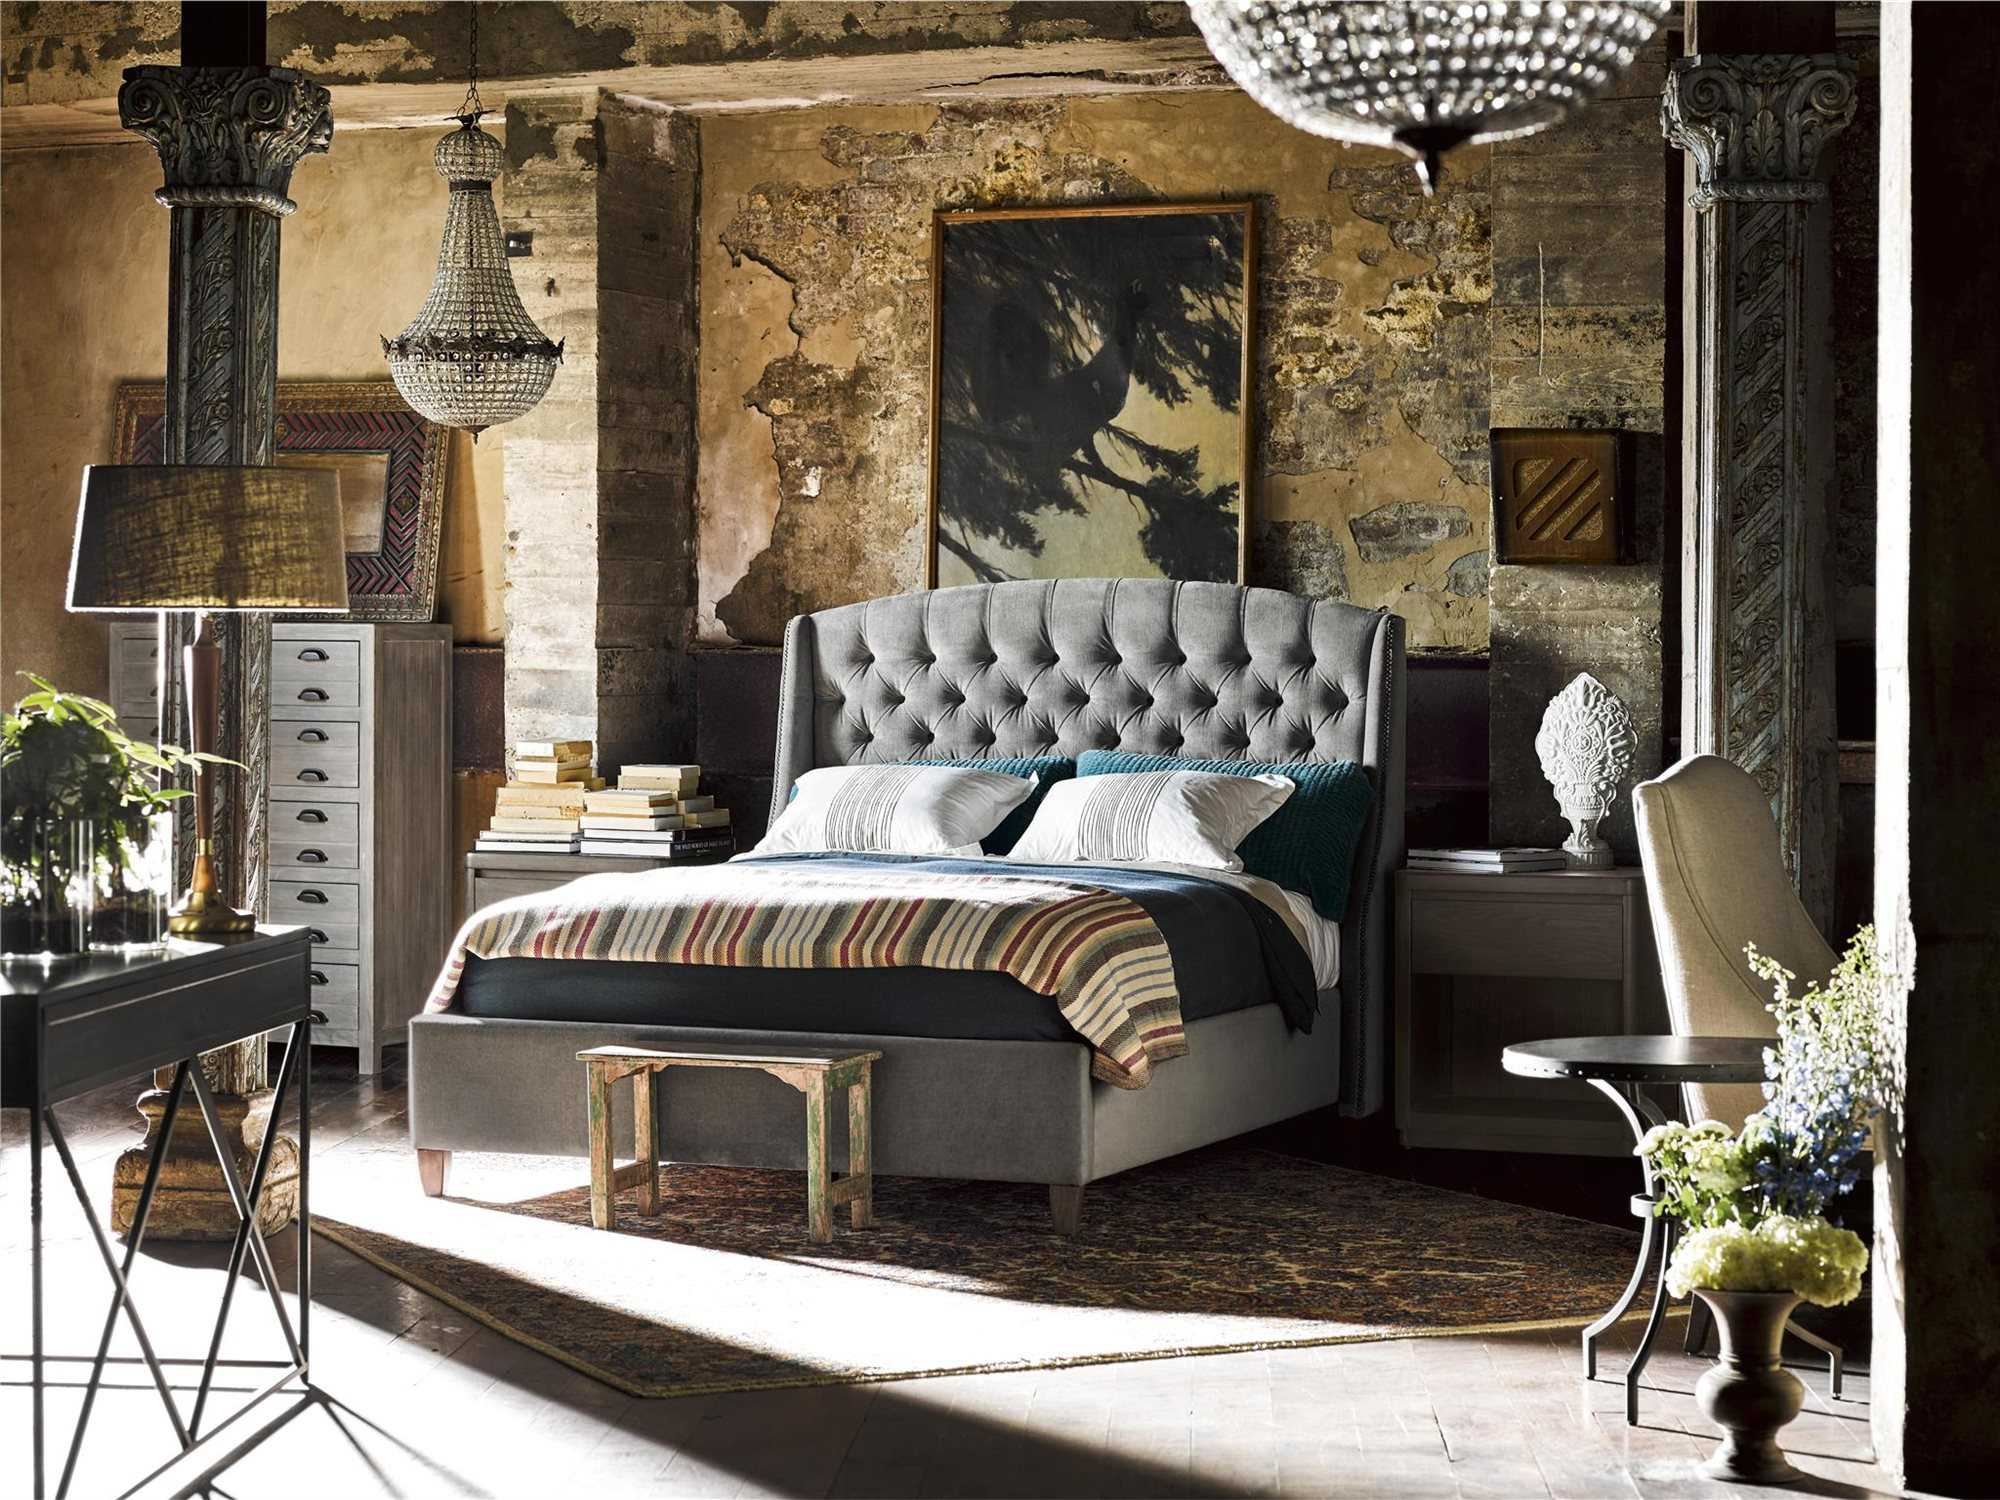 universal furniture curated 56 39 39 l x 28 39 39 w rectangular greystone pembroke computer desk uf558813. Black Bedroom Furniture Sets. Home Design Ideas